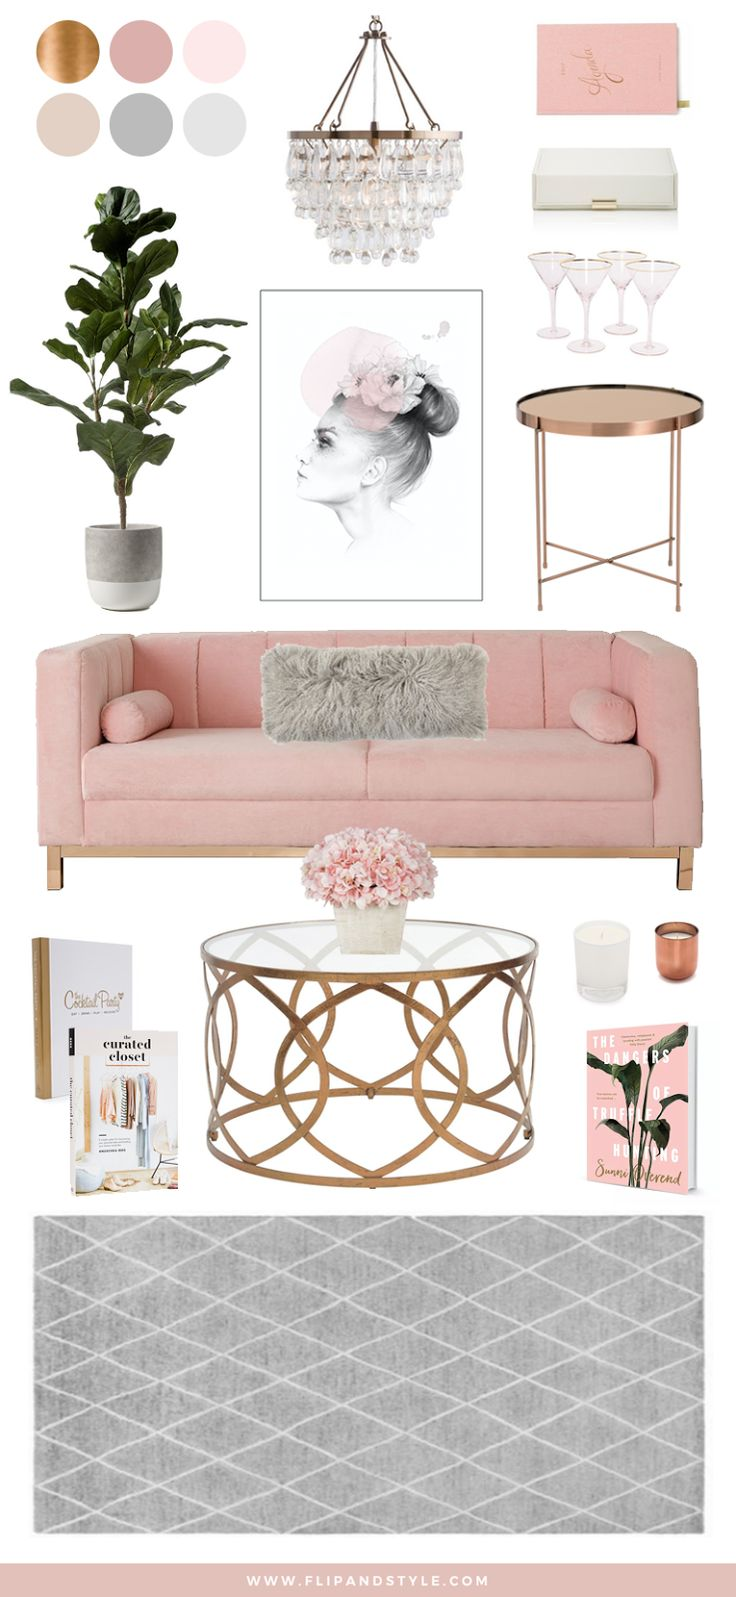 Best 25+ Pink living rooms ideas on Pinterest | Pink live ...